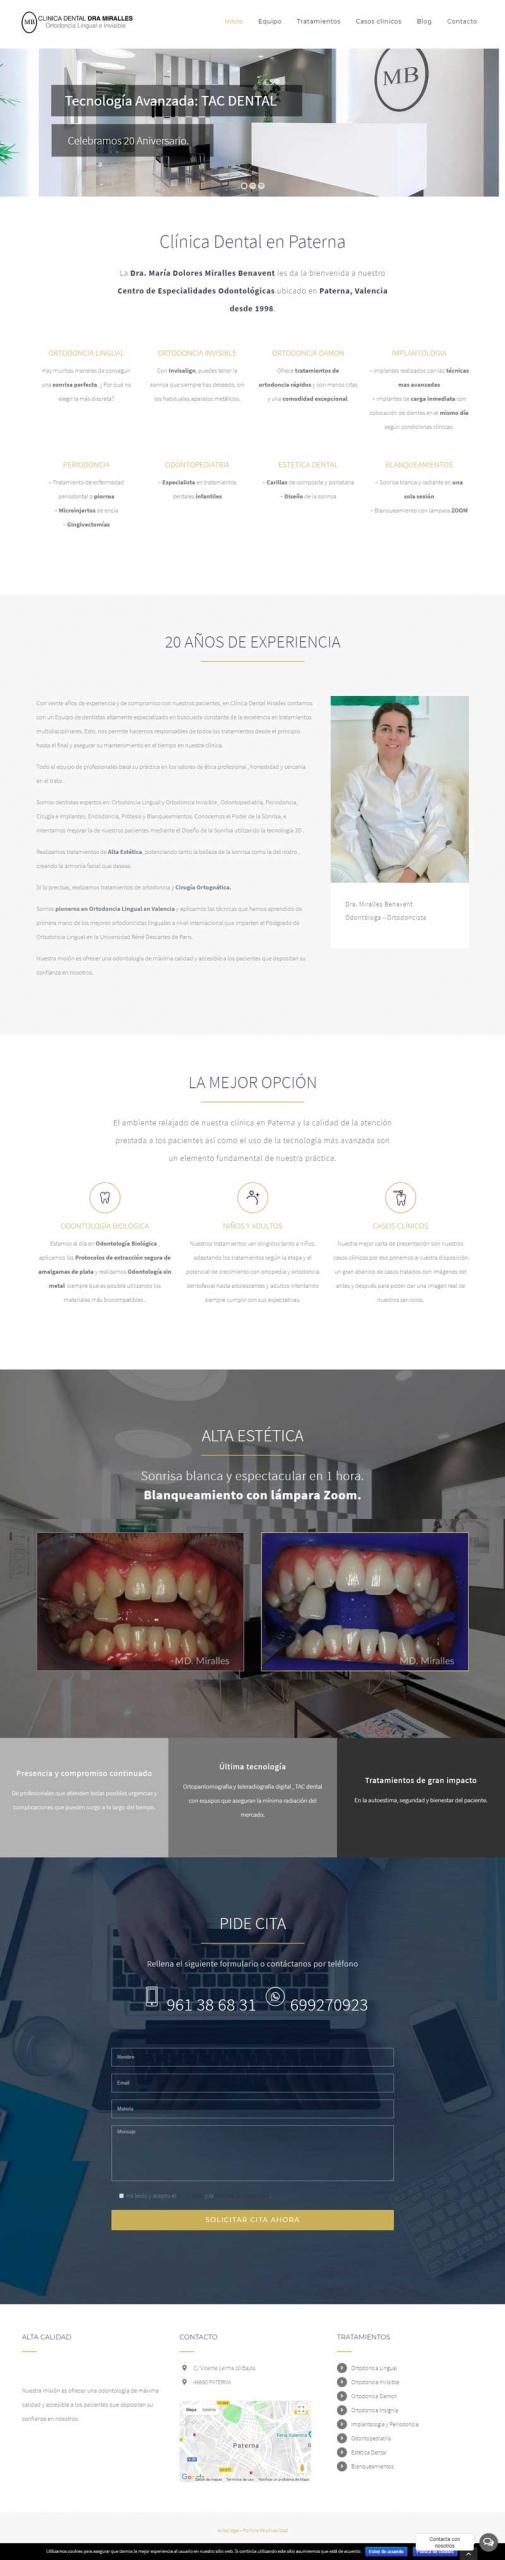 ortodoncia-miralles-inicio-portfolio-aeuroweb